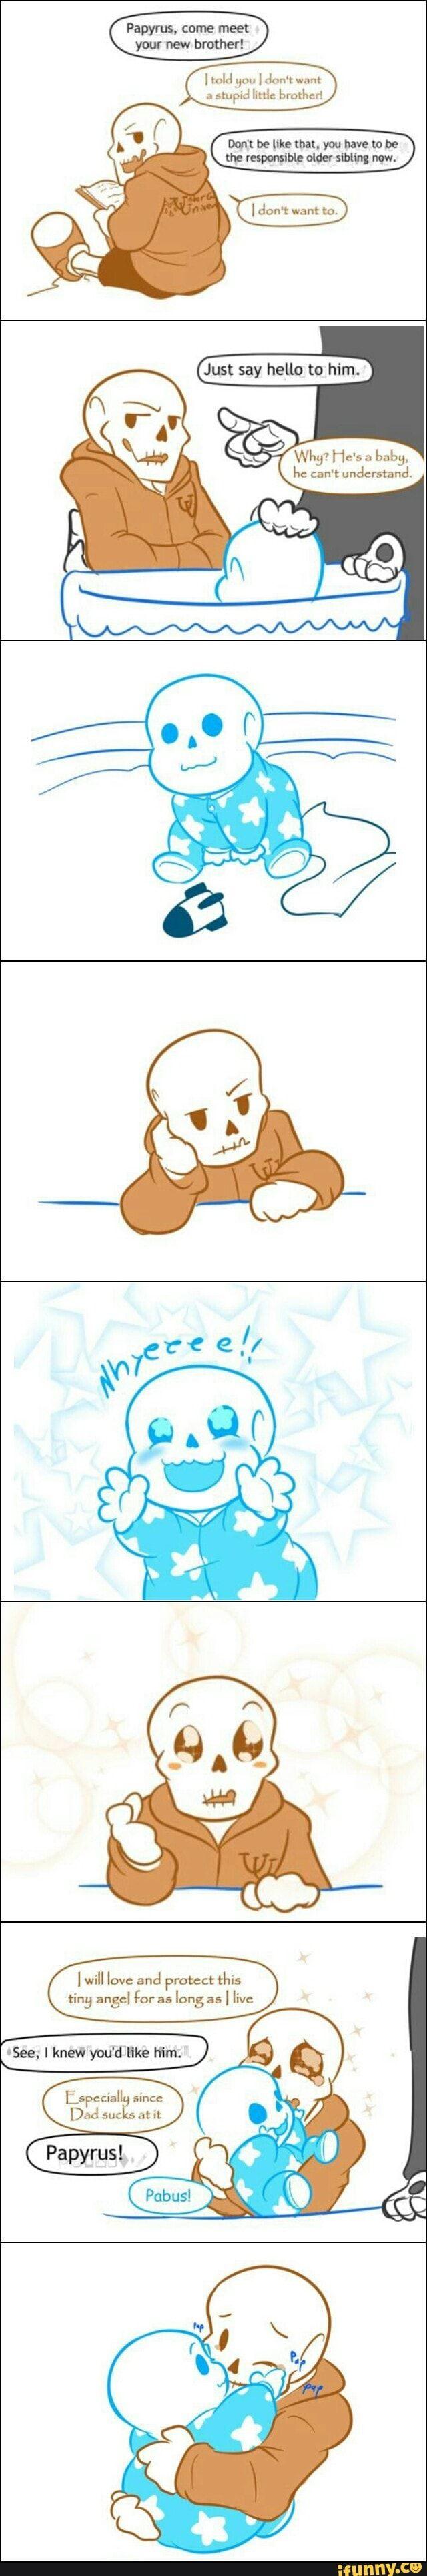 underswap baby sansy>>> *Shreiks* CEUUUUUUWT!!! :3